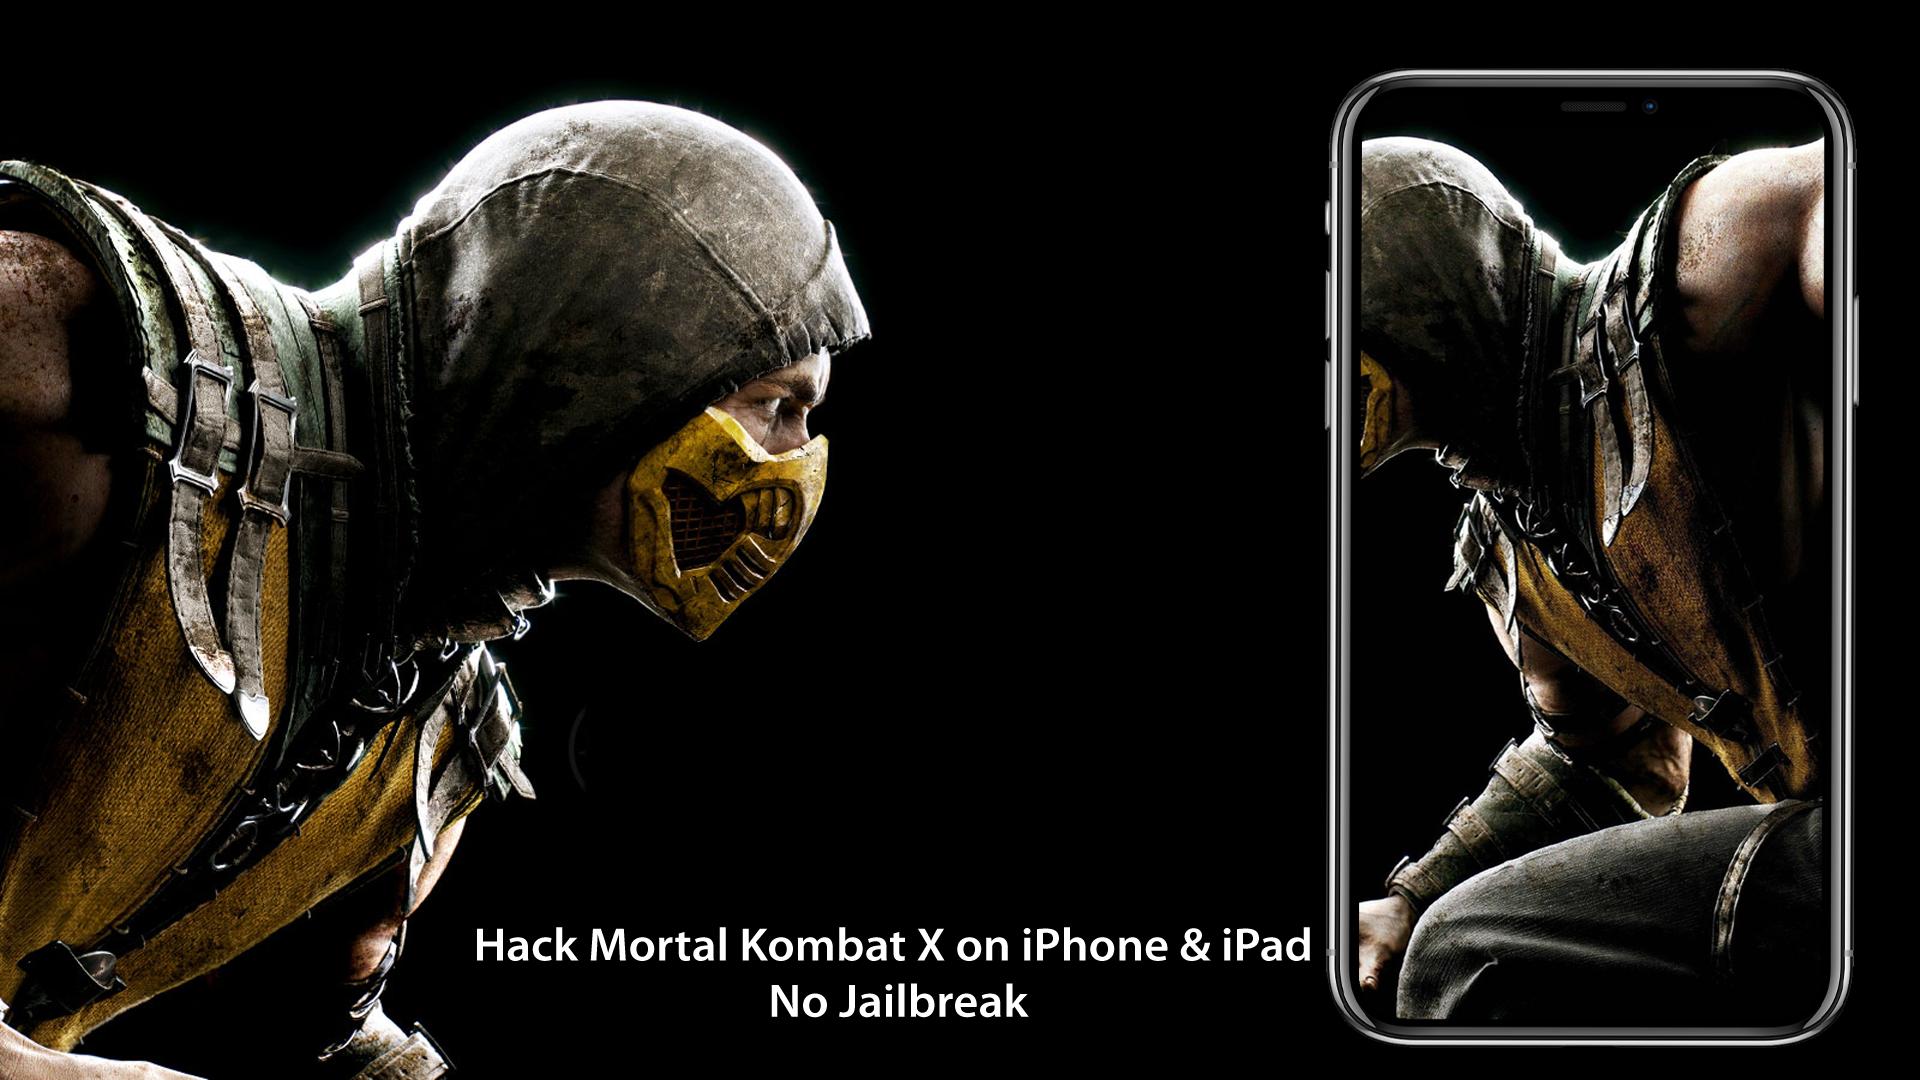 Mortal Kombat X Hack on iOS 12 Without Jailbreak [100